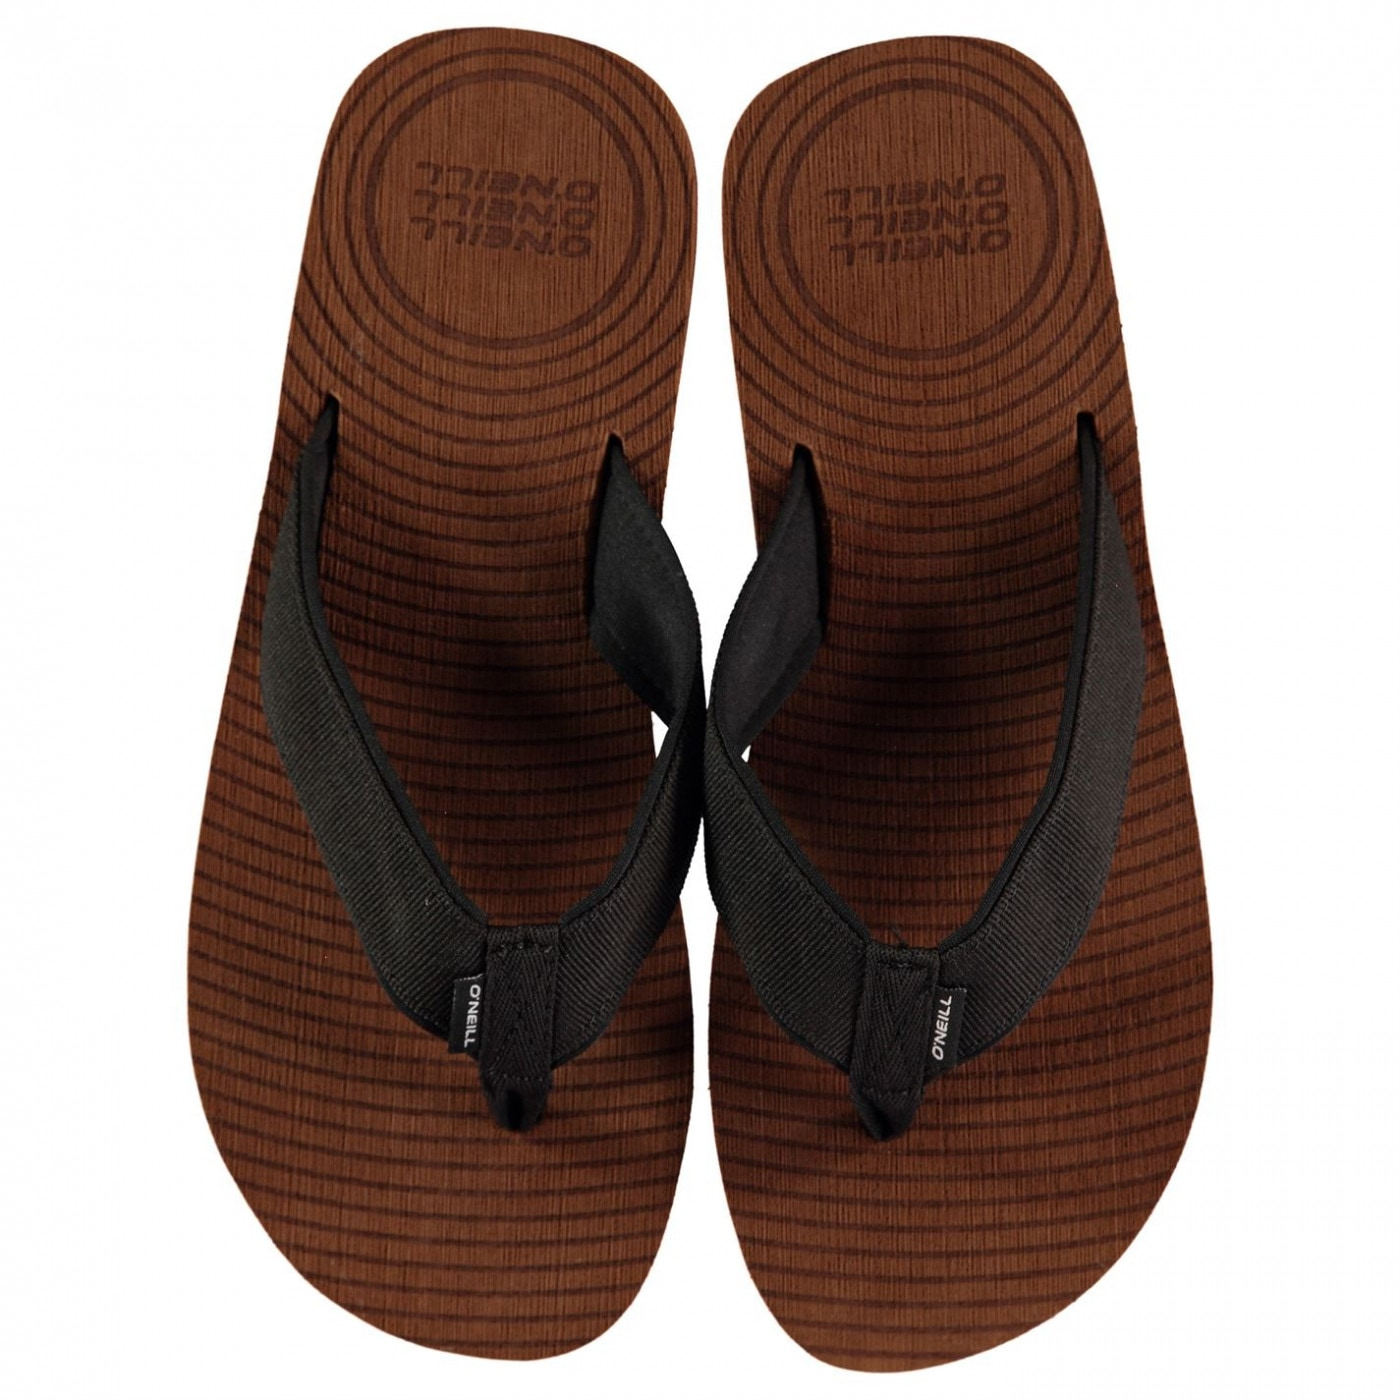 ONeill Koosh Slide Flip Flops Mens